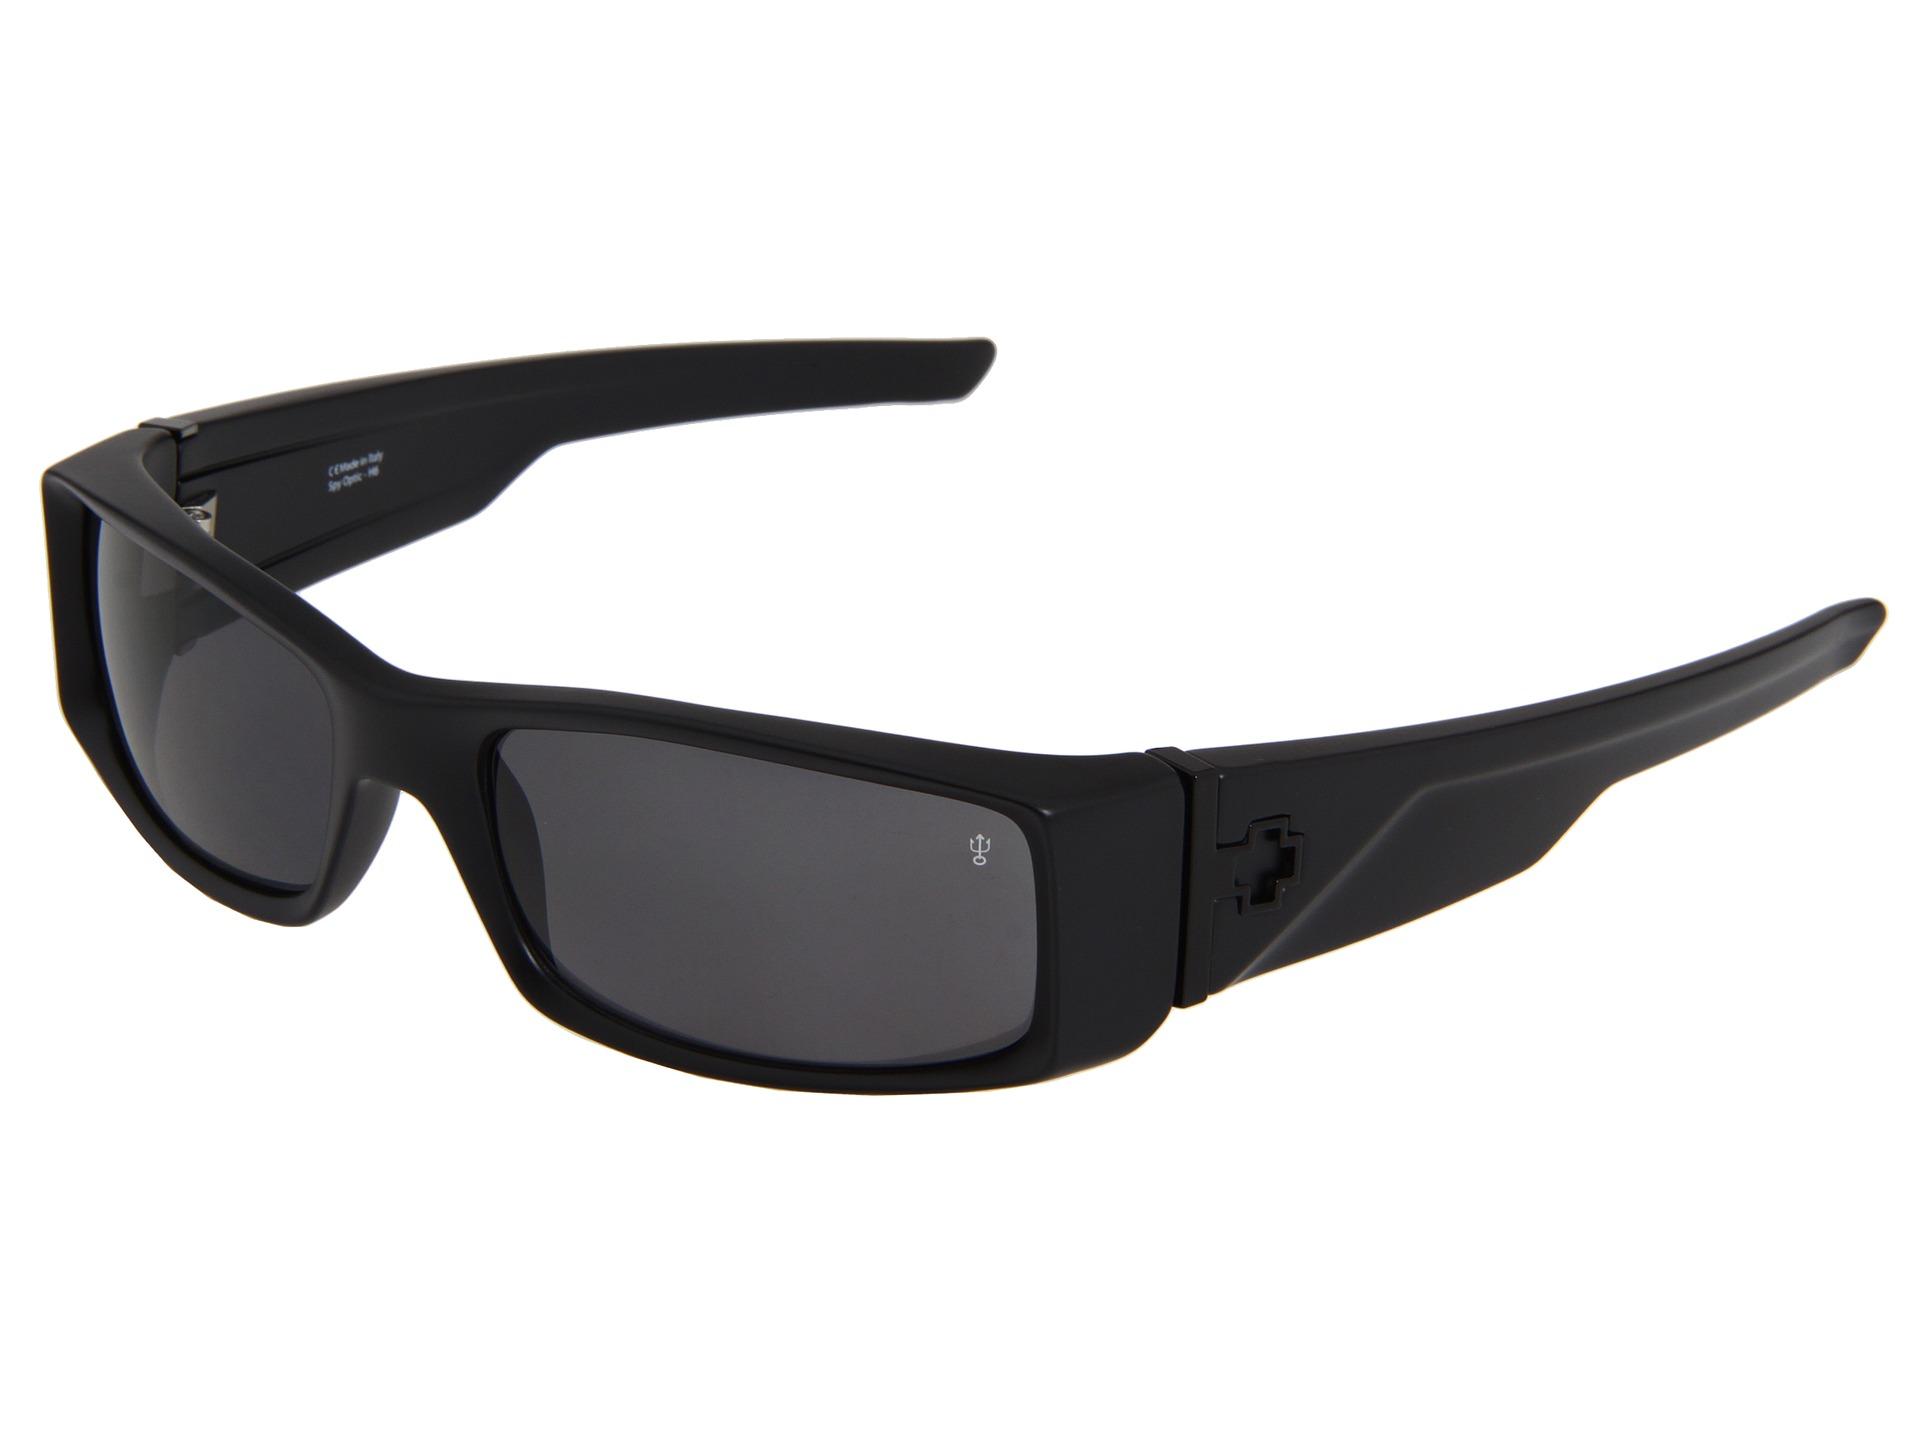 b5f625718ad Spy Optics Hielo Sunglasses Polarized Mens « Heritage Malta